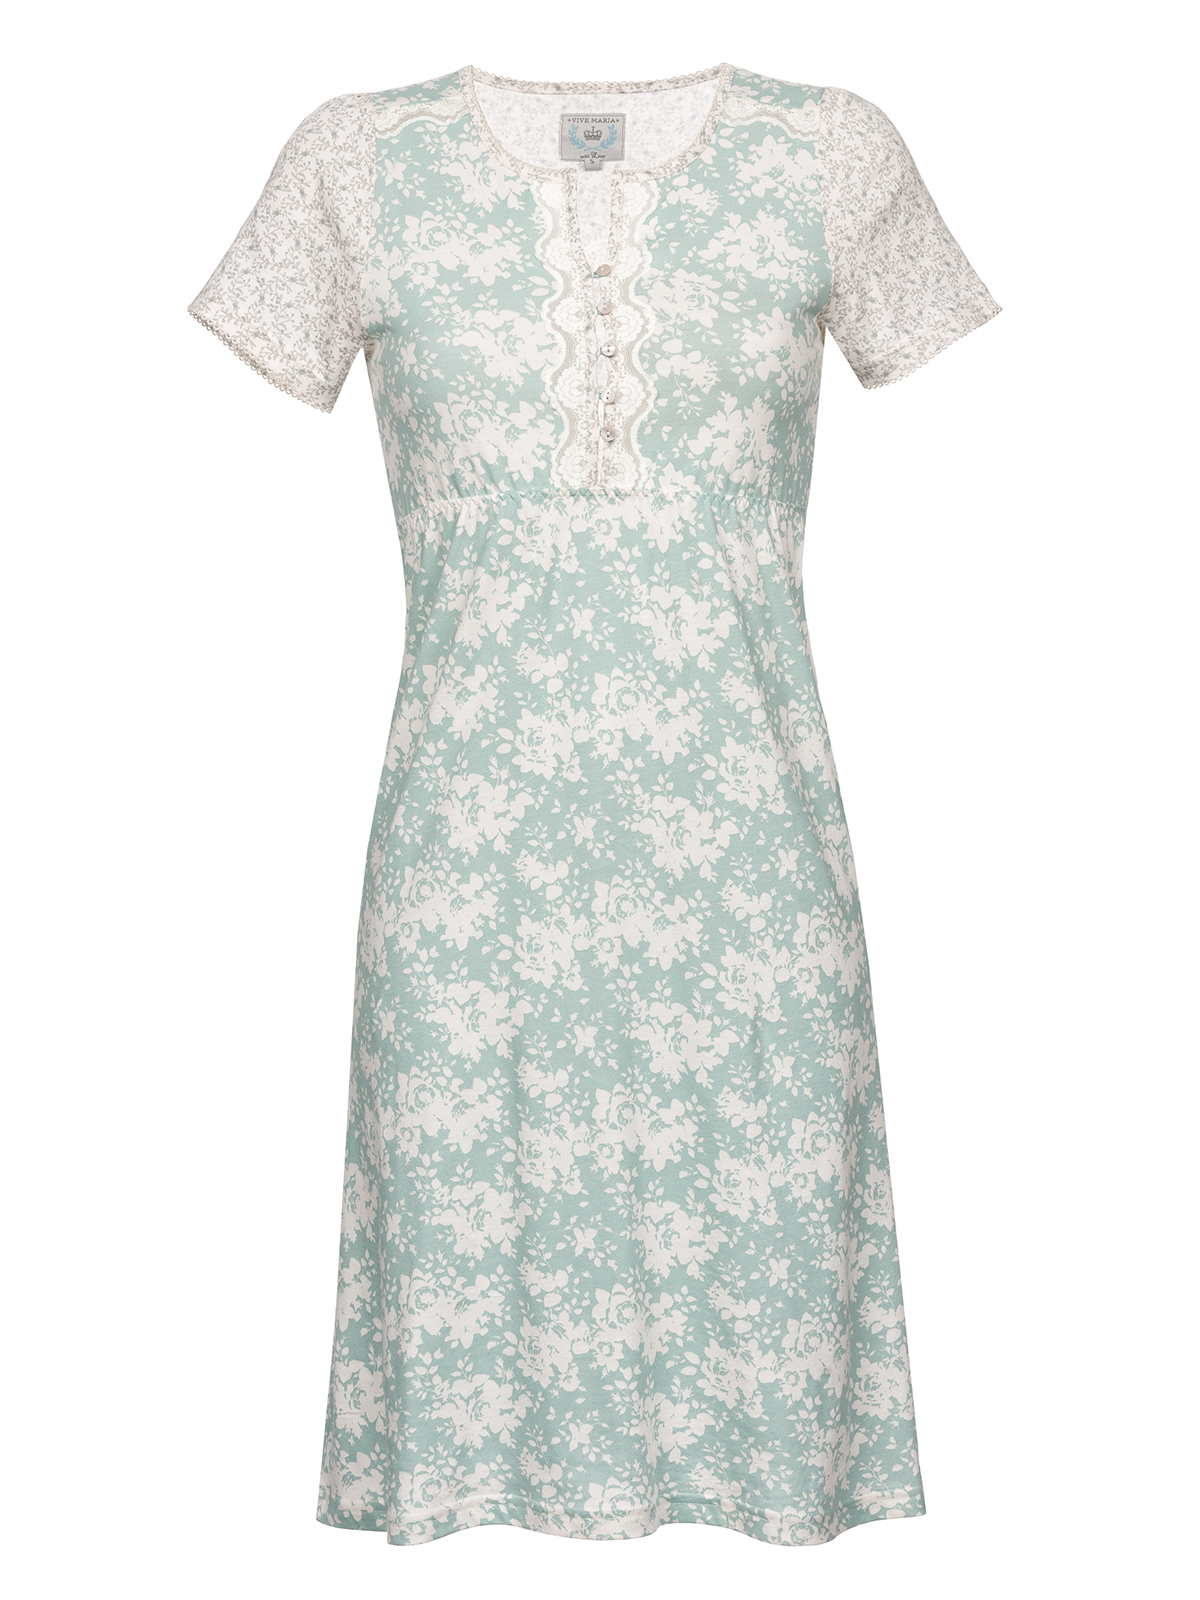 ab9108767b05c1 Vive Maria Charming Rose Nightdress Blue Allover/ Cream Allover | Napo  Webshop